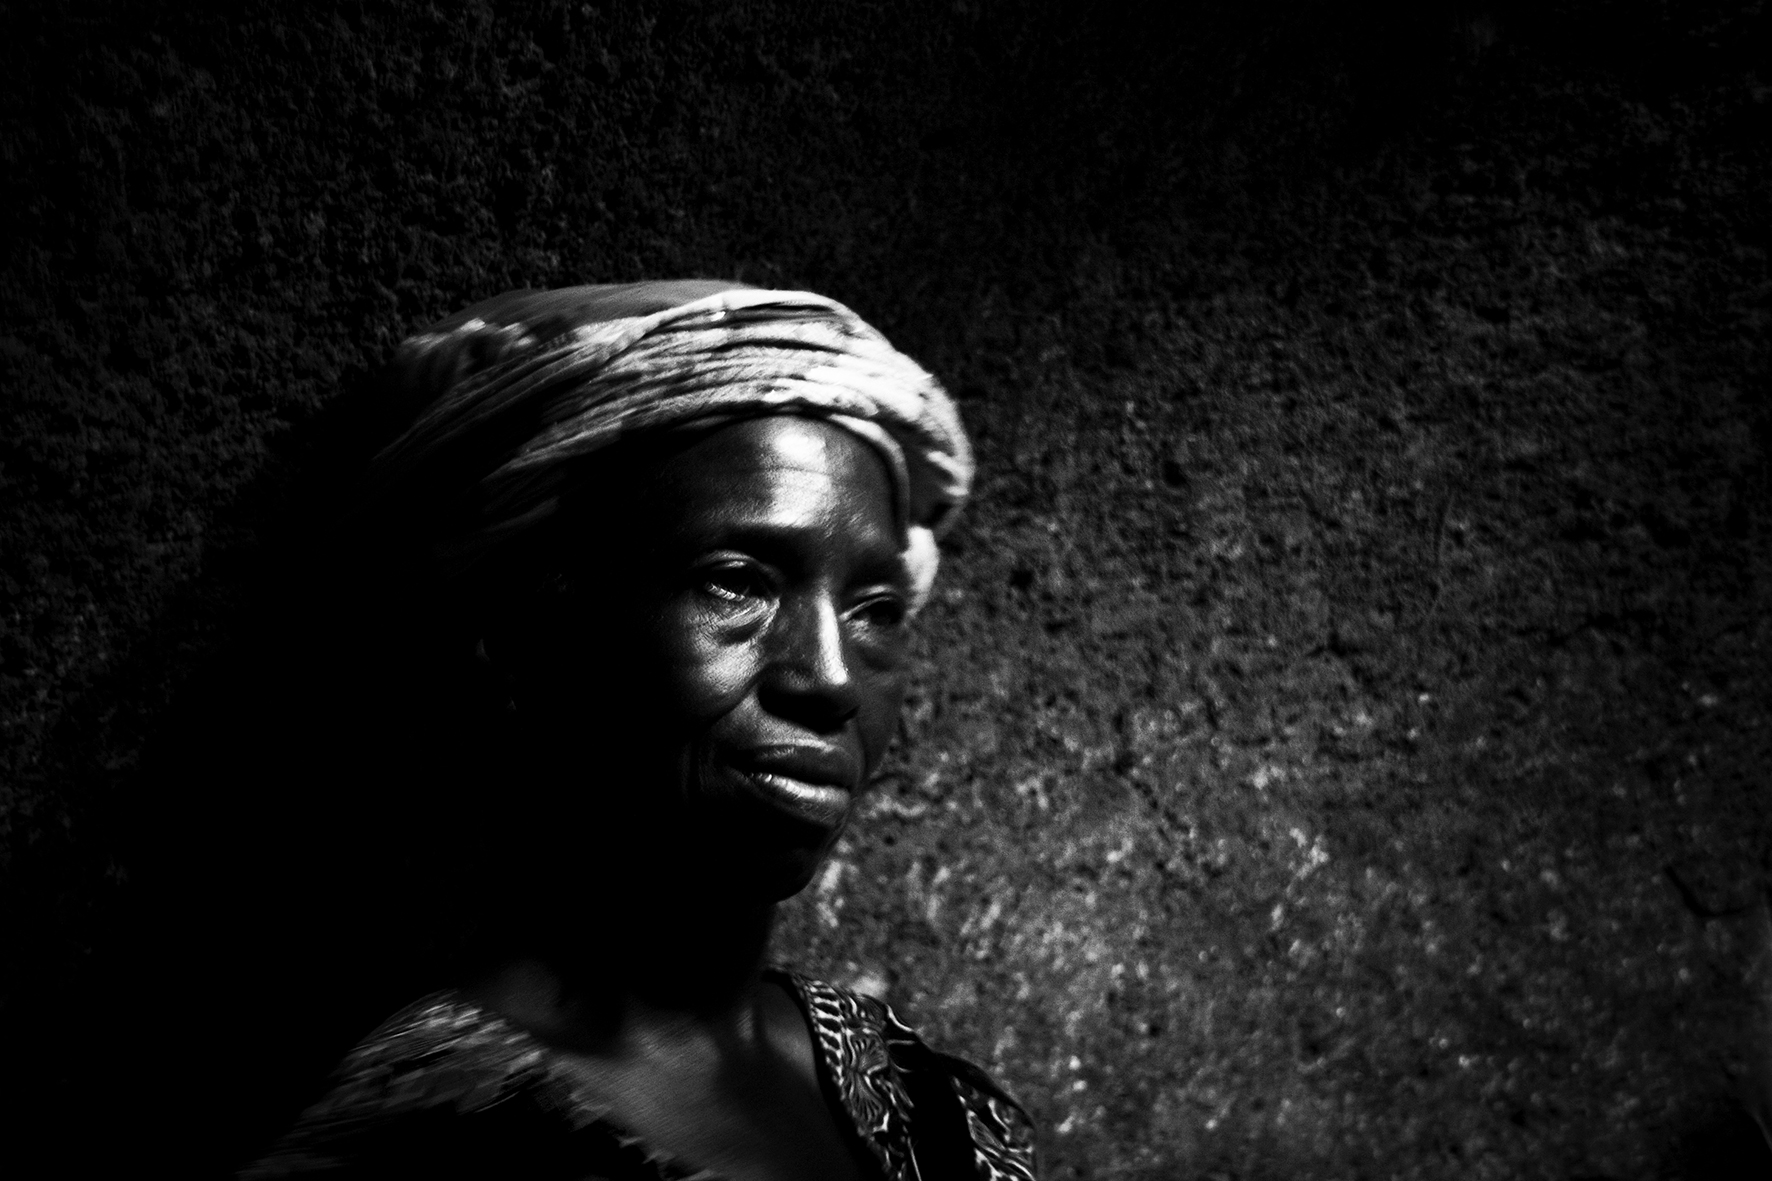 Burkina Faso. 2010